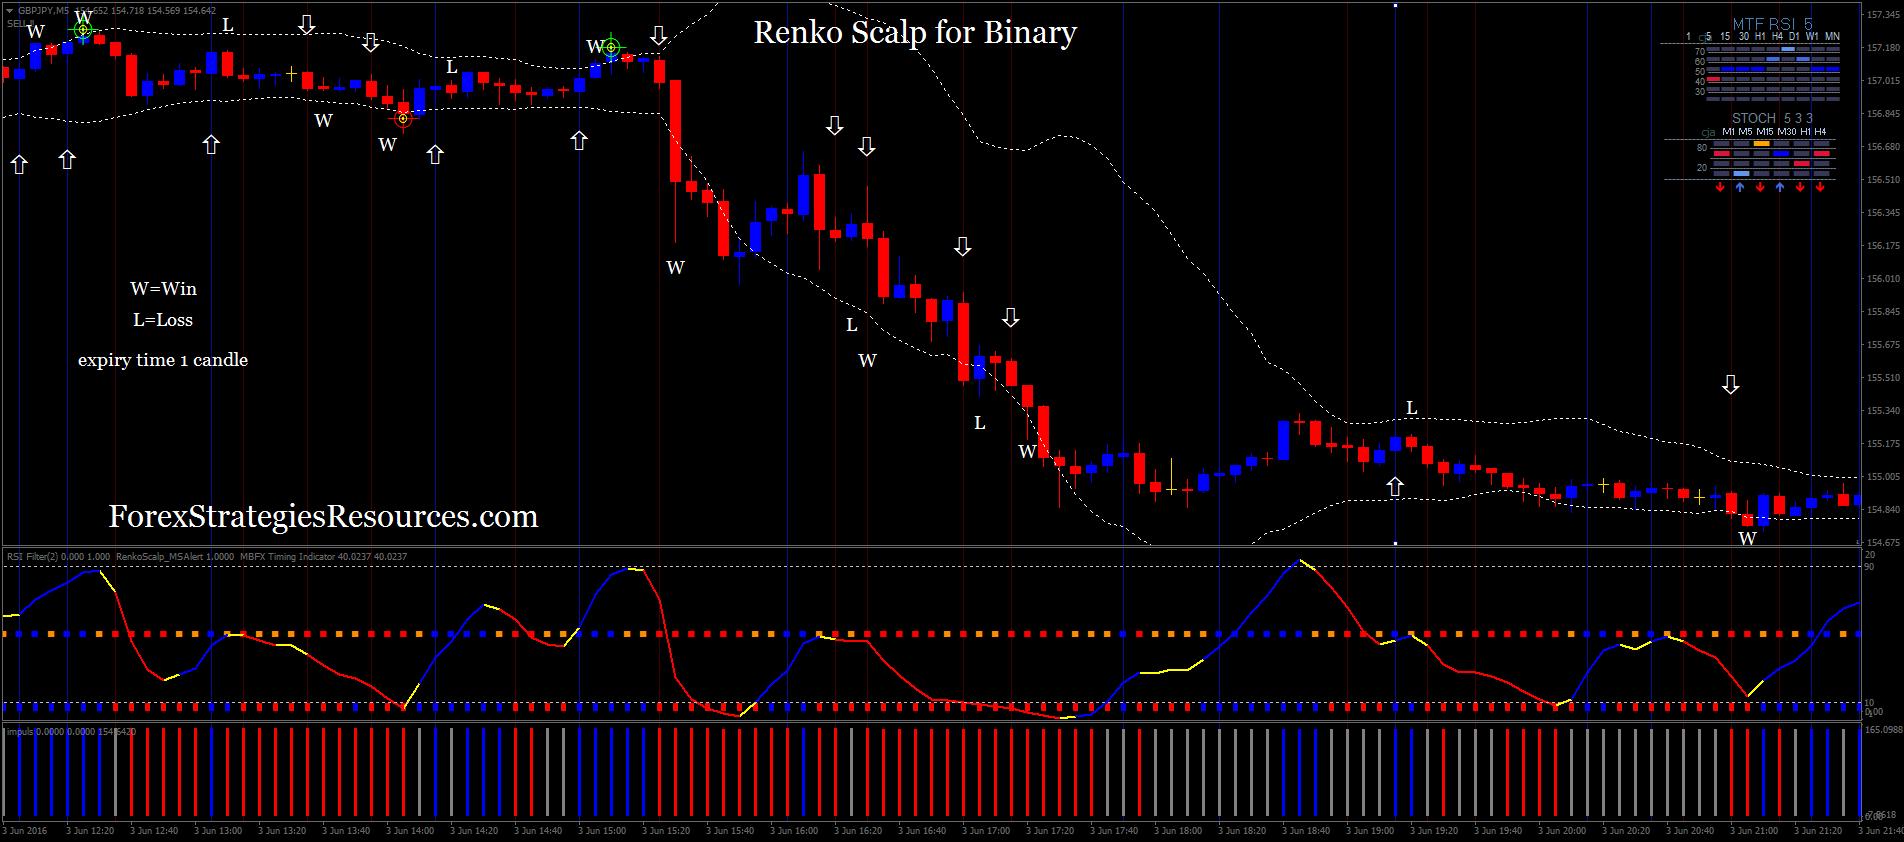 Renko scalp trading system